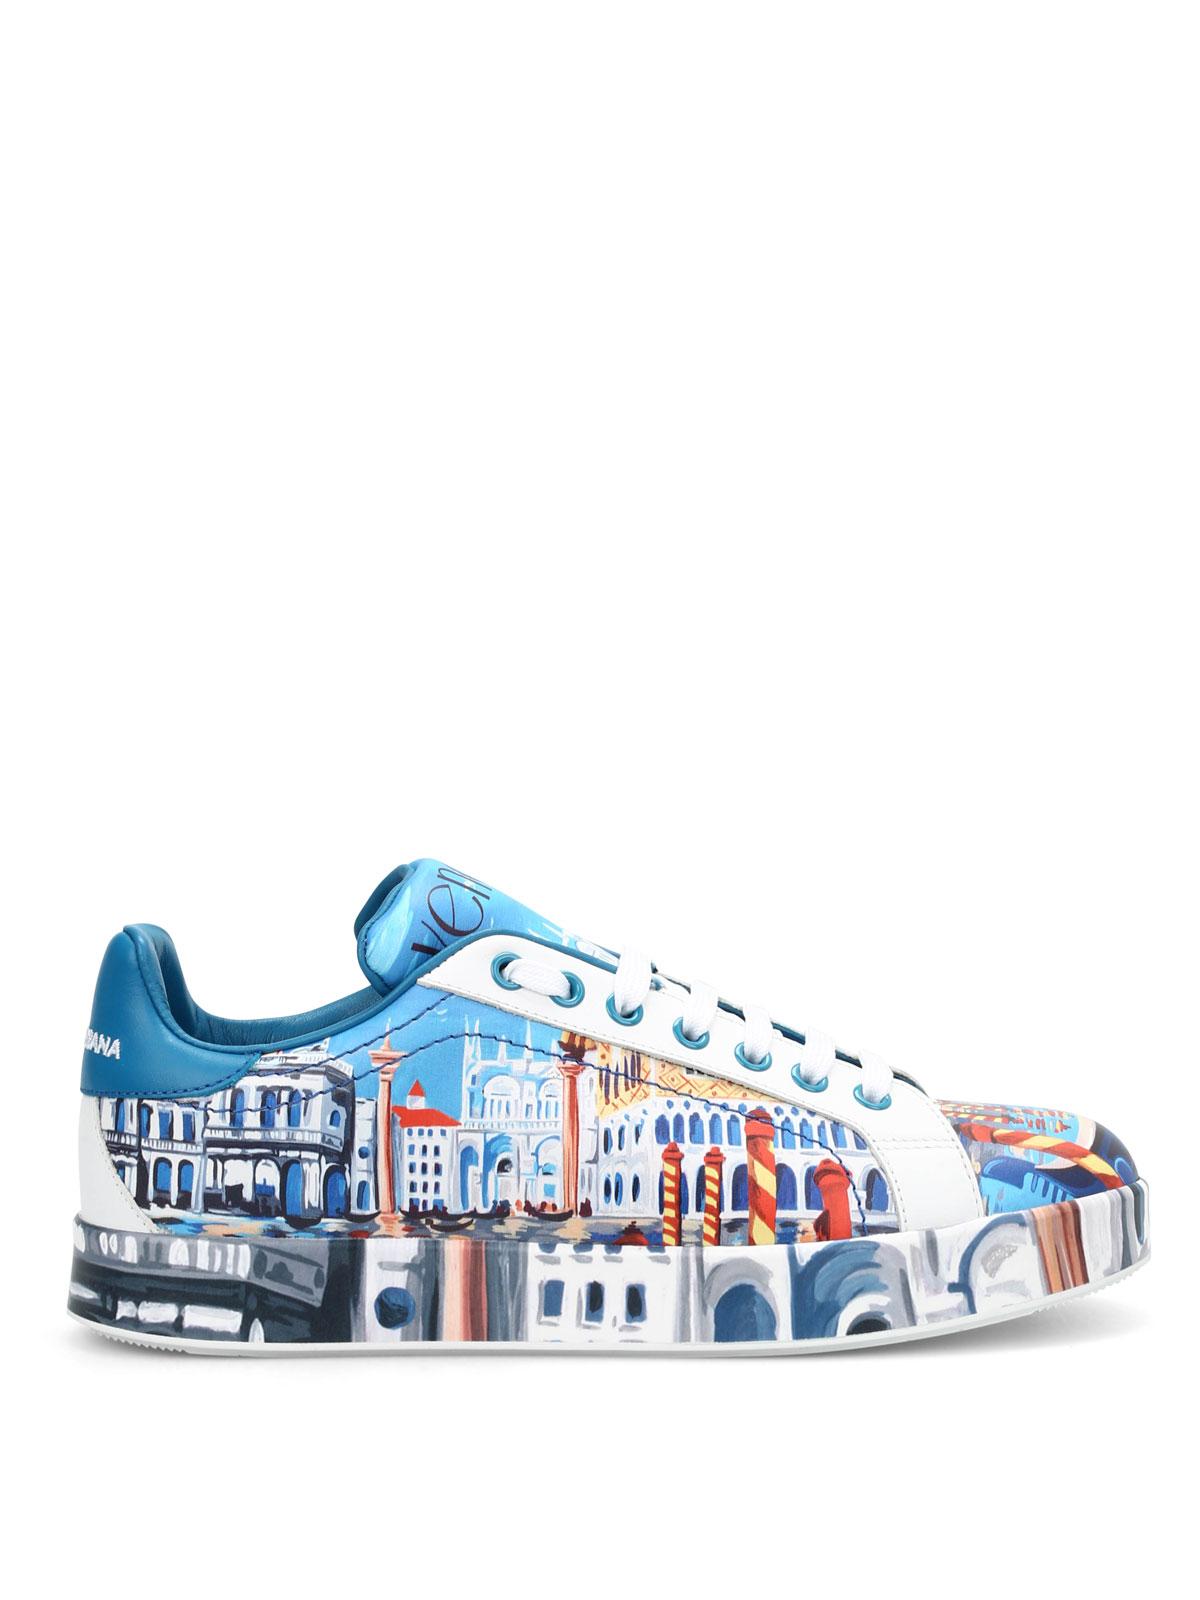 Love Italia Dolce 8q042 Gabbana Ck0065 amp; Sneaker Ab278 Is Sneakers AFxRBwq